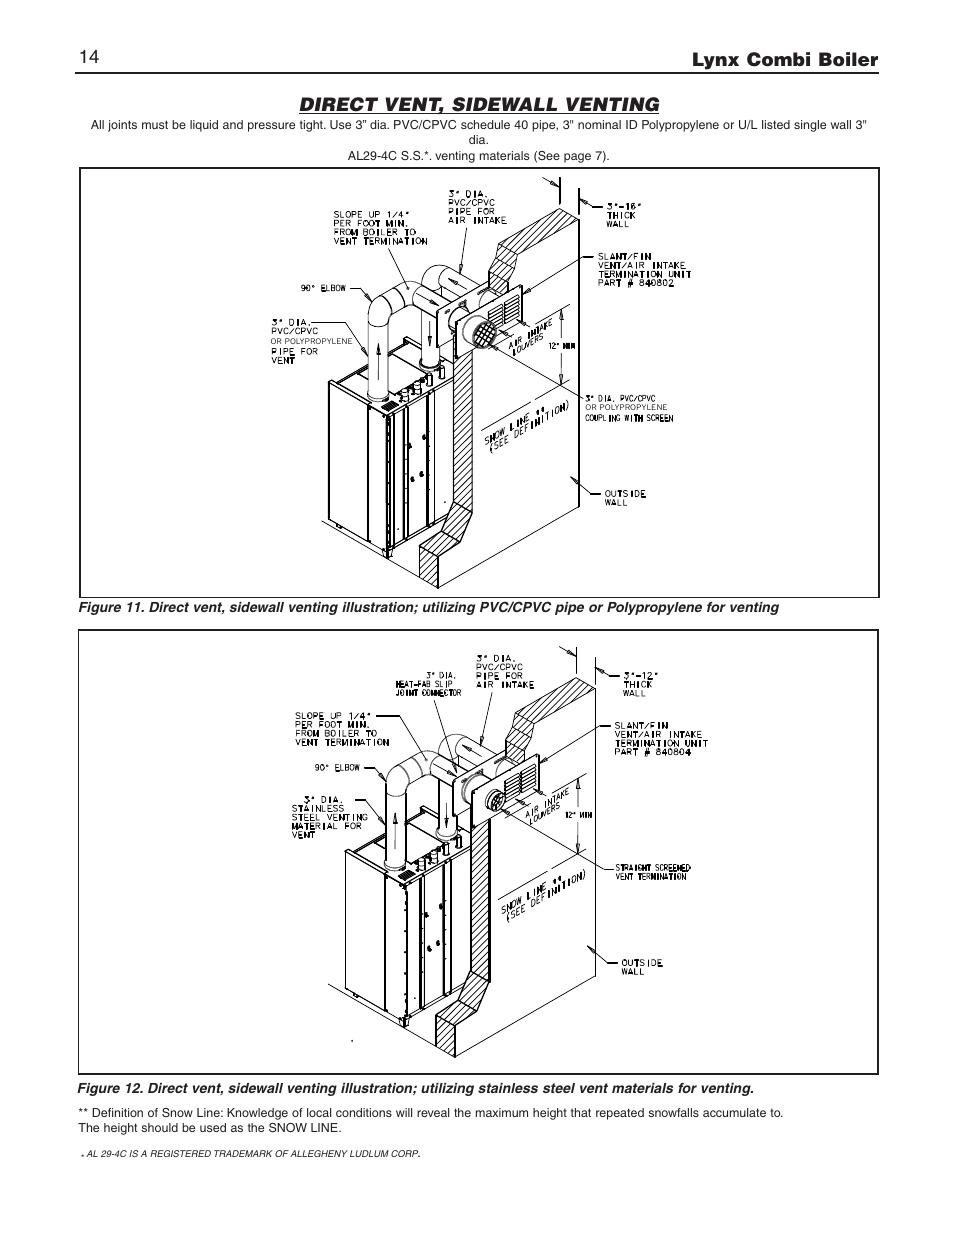 Lynx Combi Boiler 14 Direct Vent Sidewall Venting Slant Fin Lx Wiring Diagram 150cb